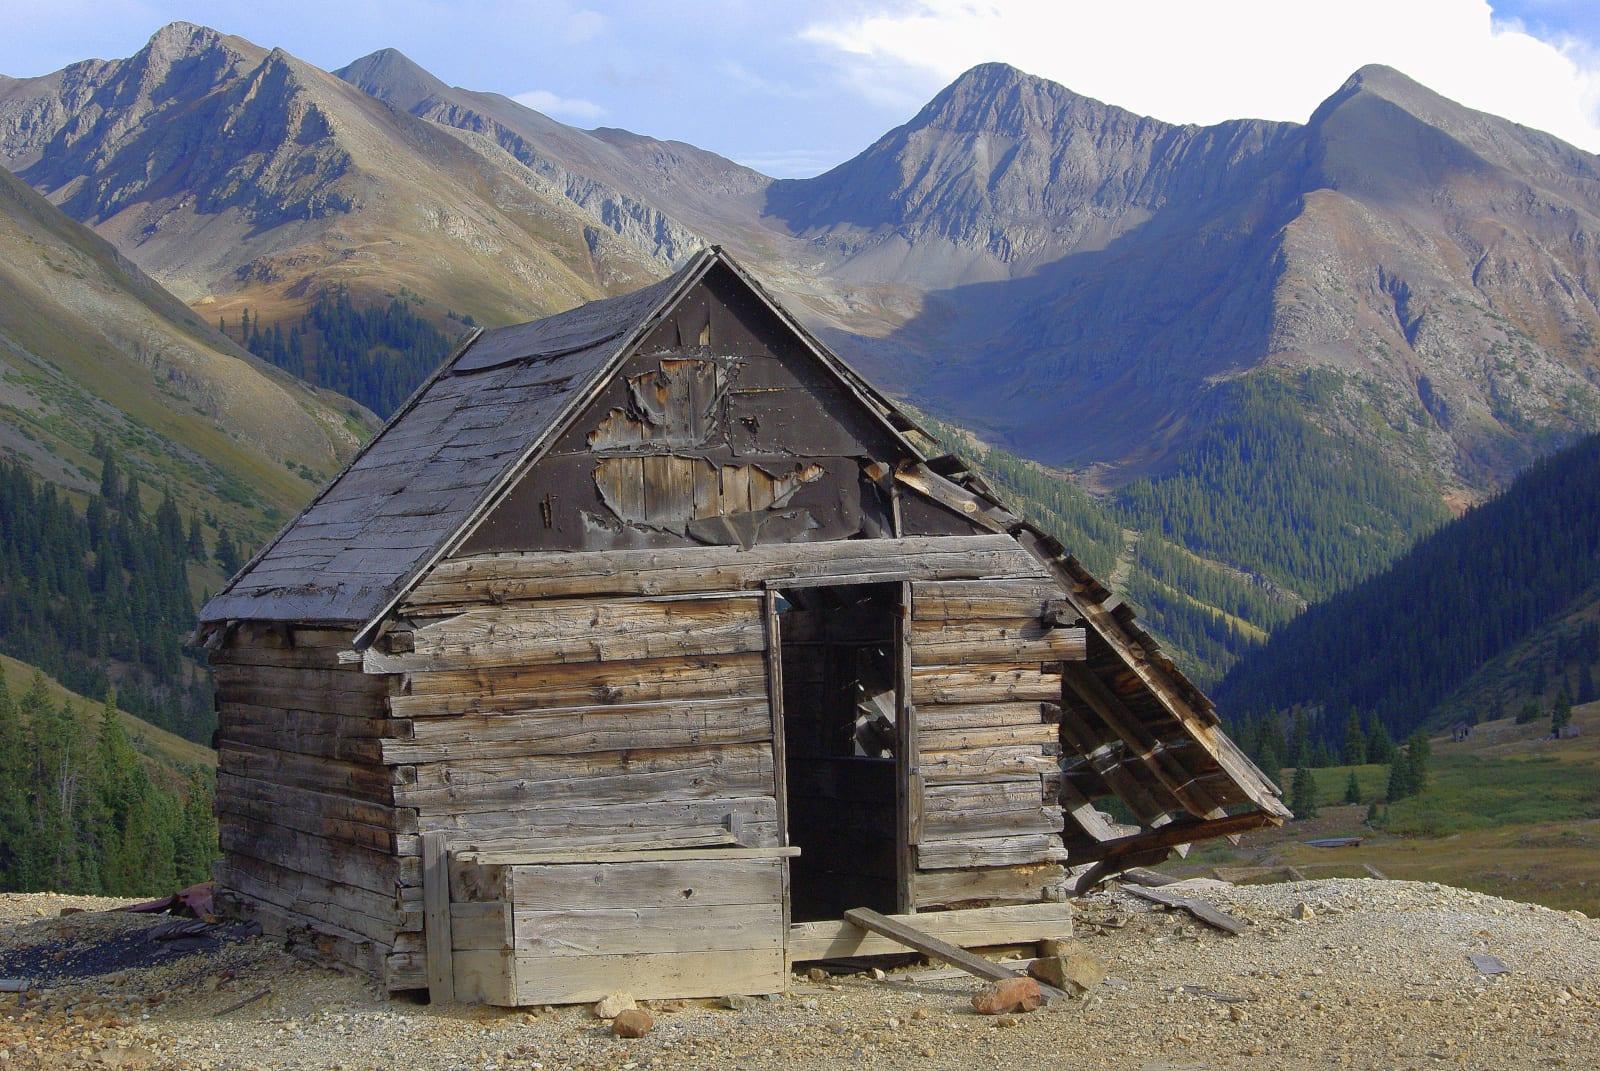 Mountain Living Colorado Abandoned Cabin on Mountainside